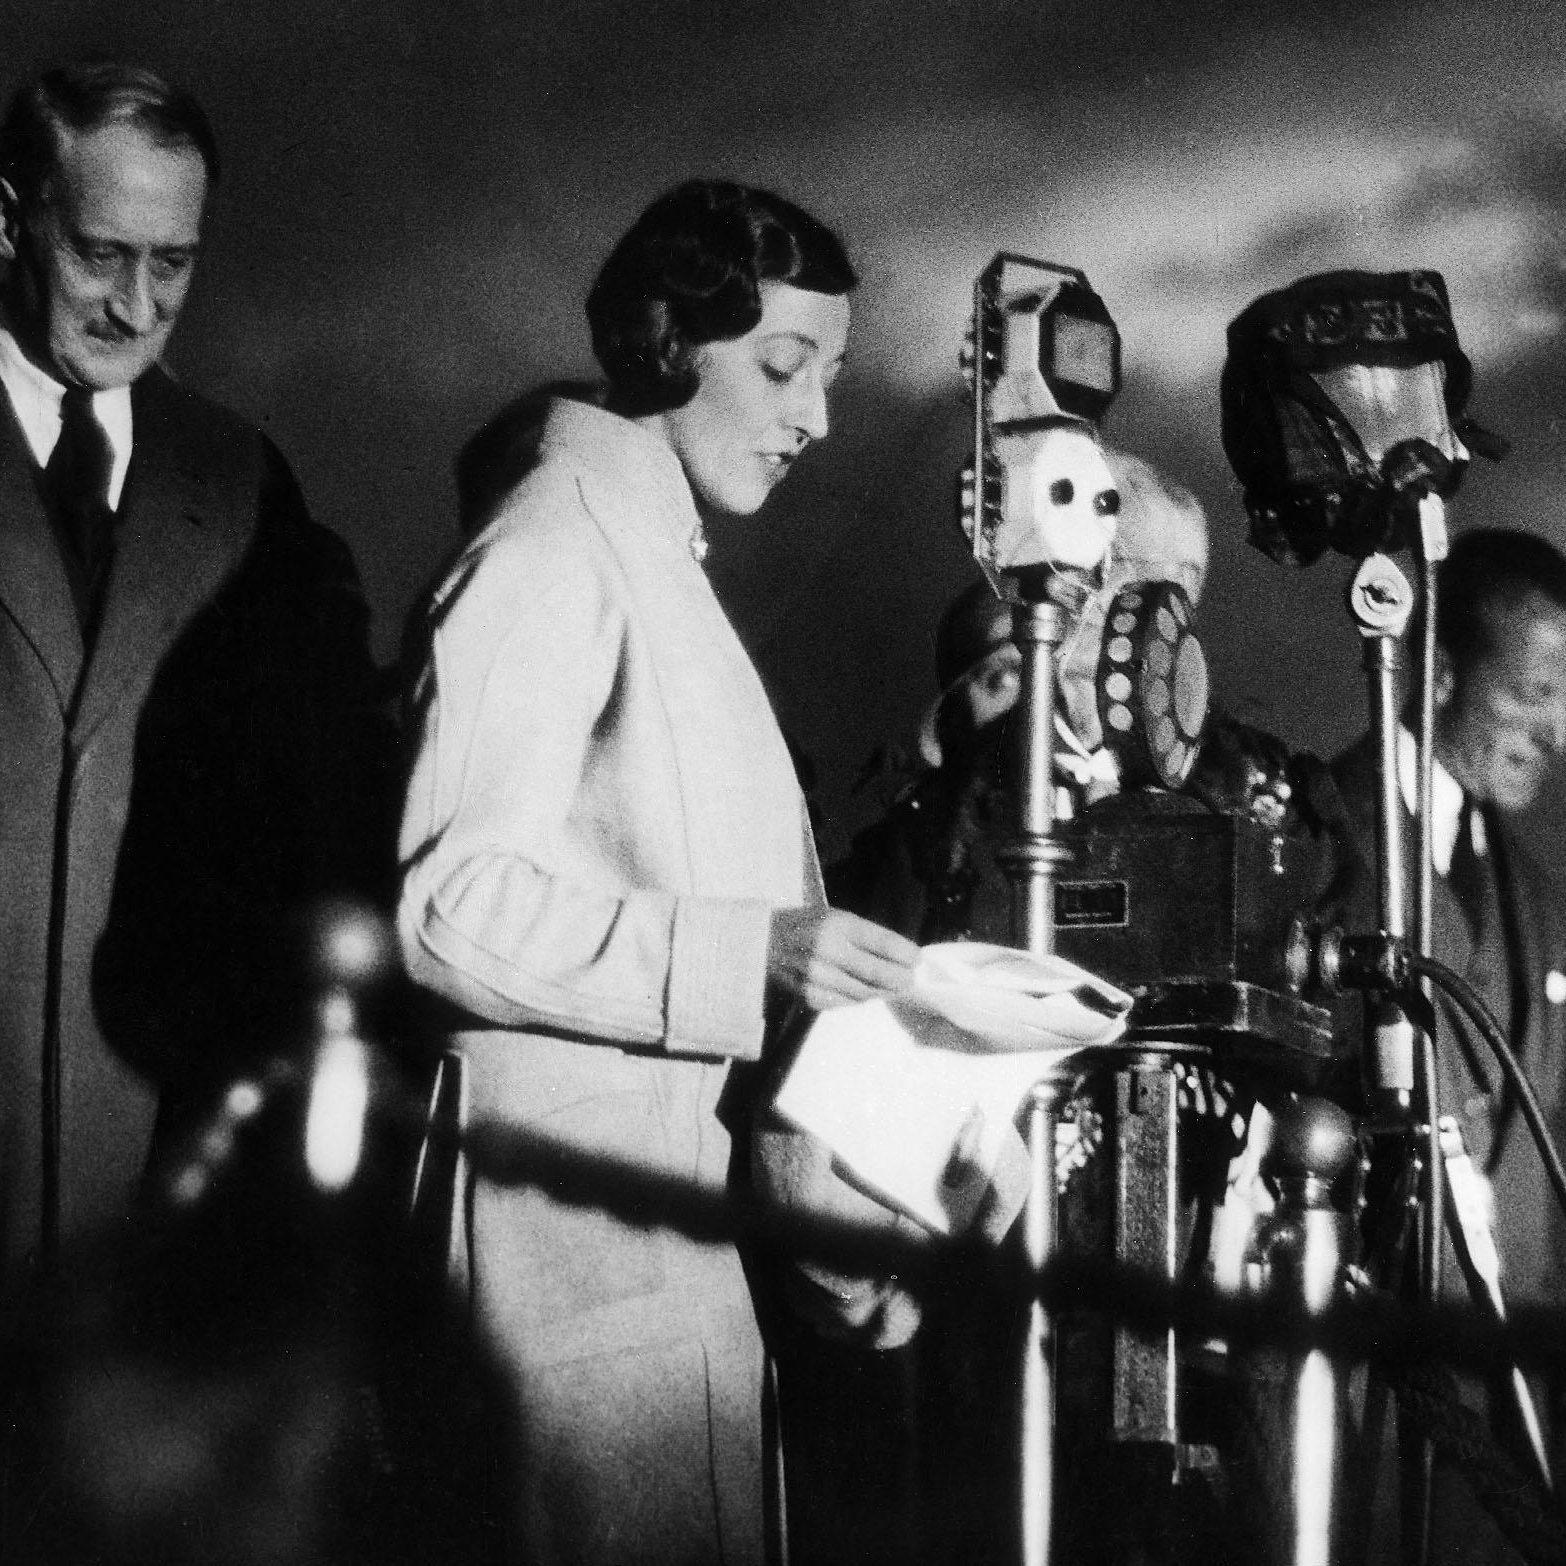 Amy Johnson talking on the radio in 1930